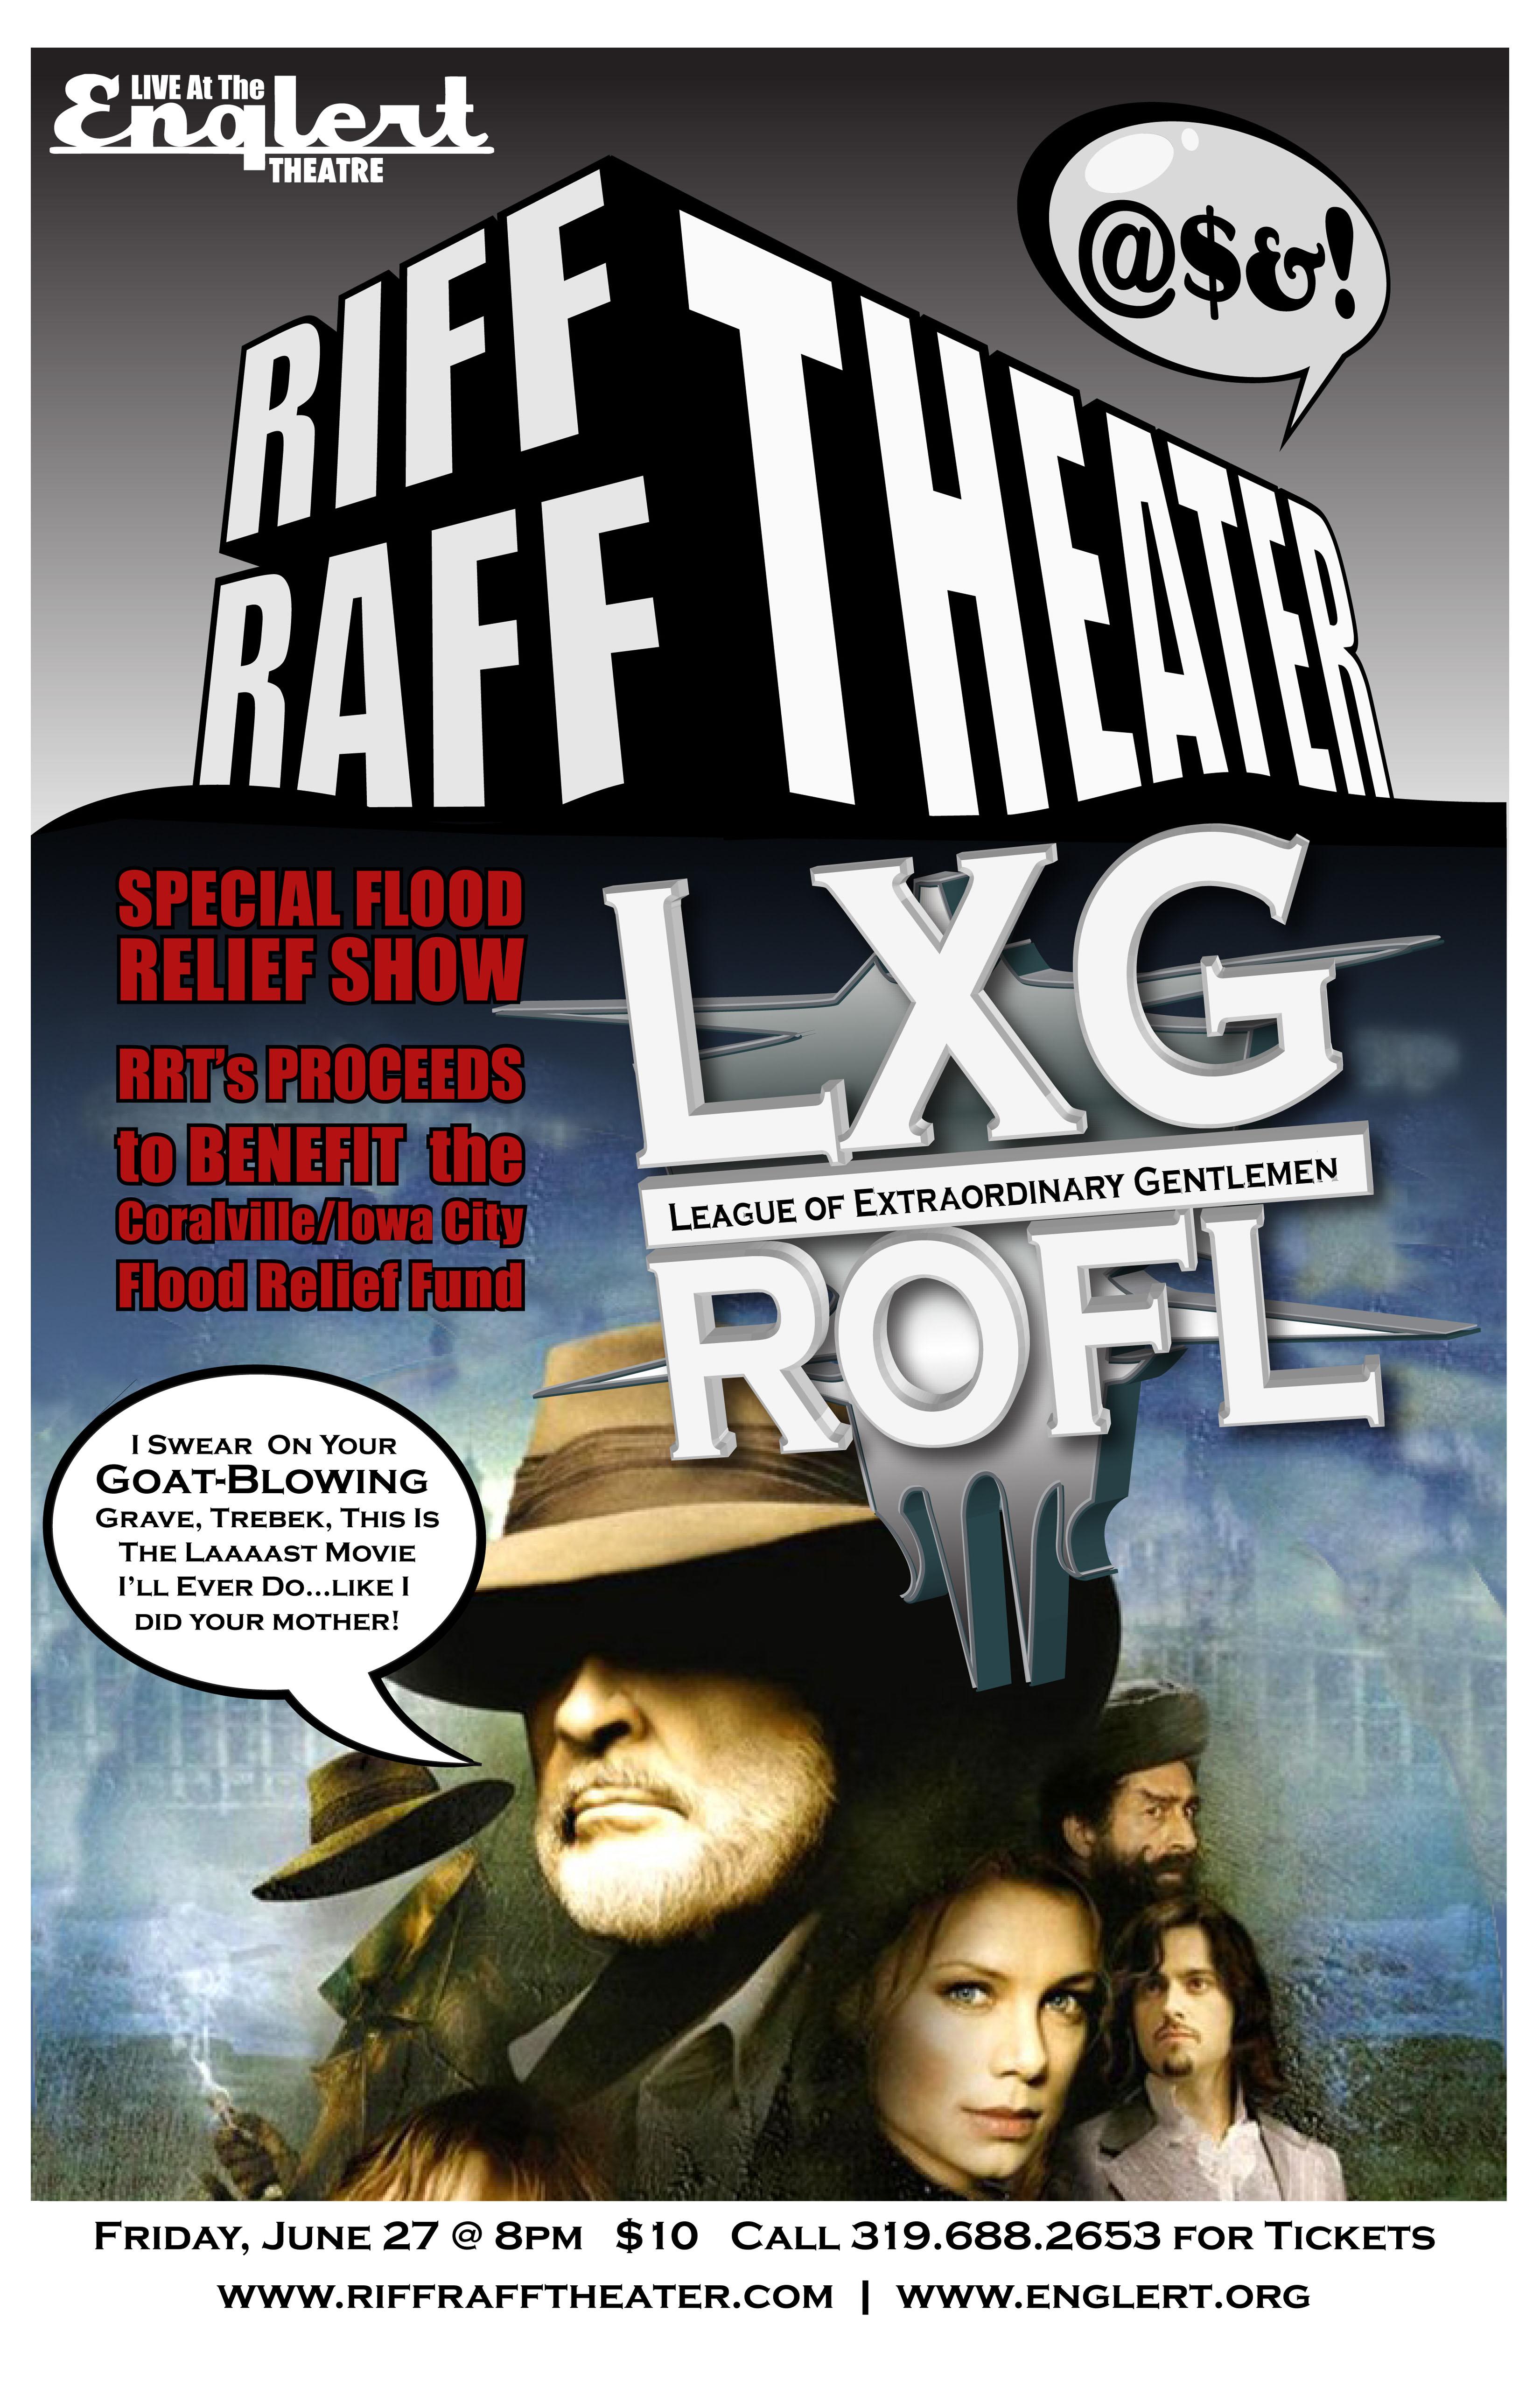 Riff Raff Theater Presents: League of Extraordinary Gentlemen (LXG)